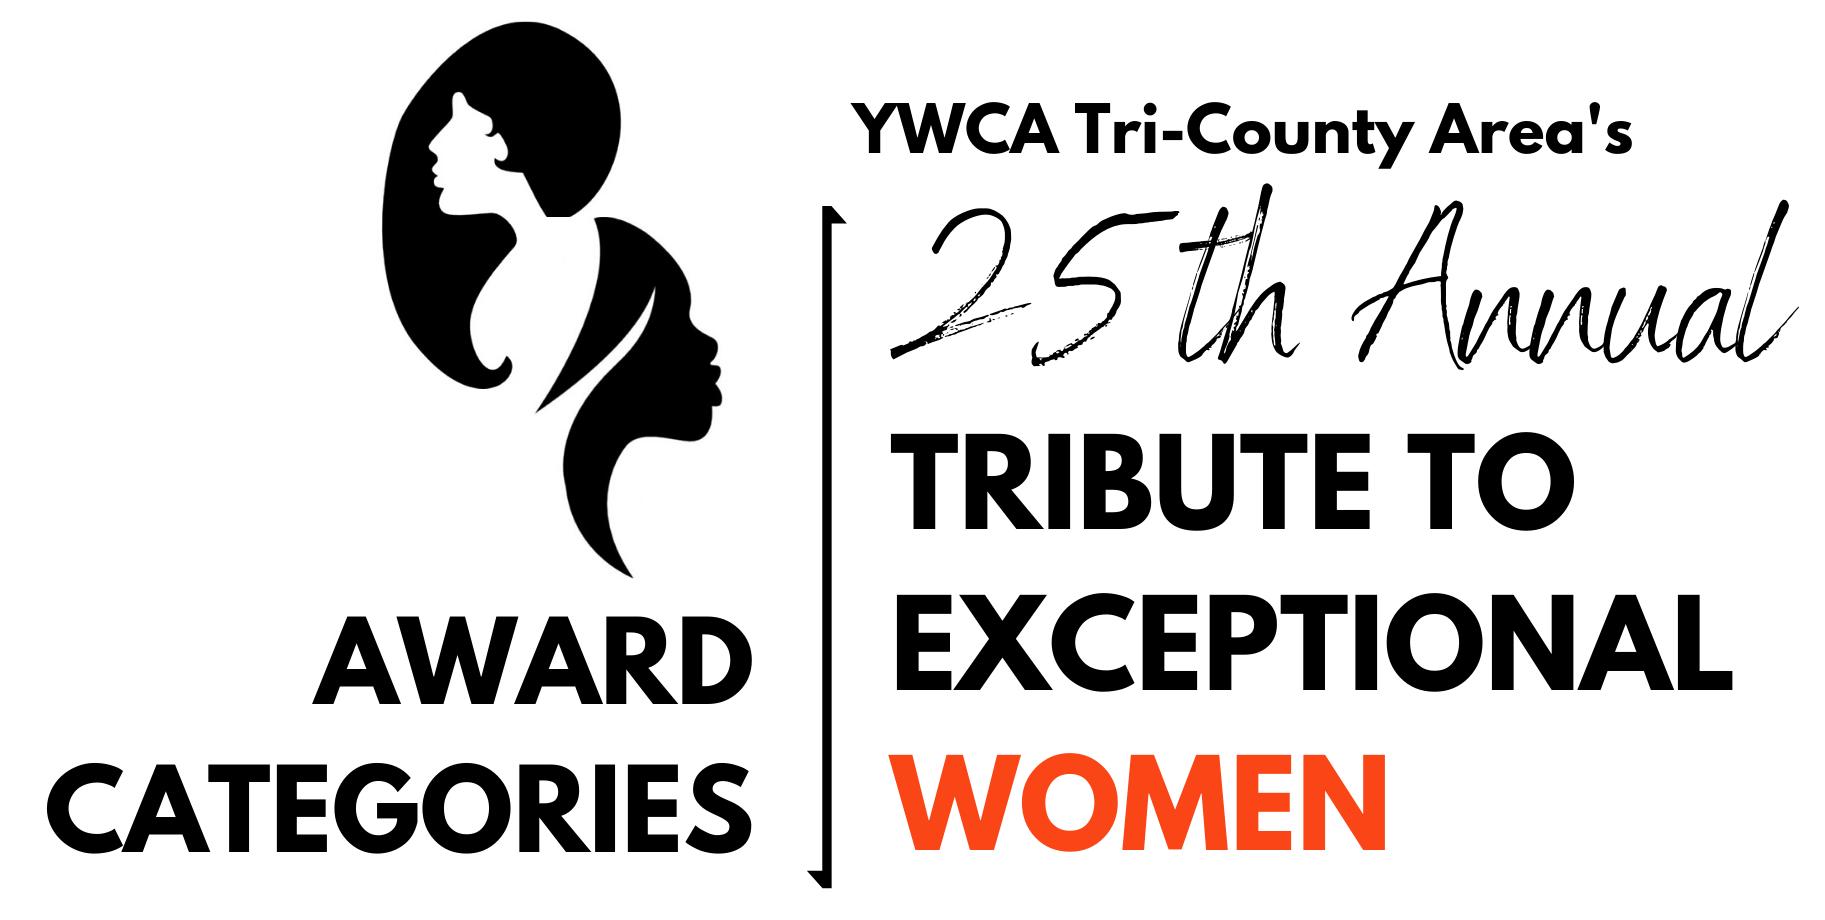 Tribute Award Categories